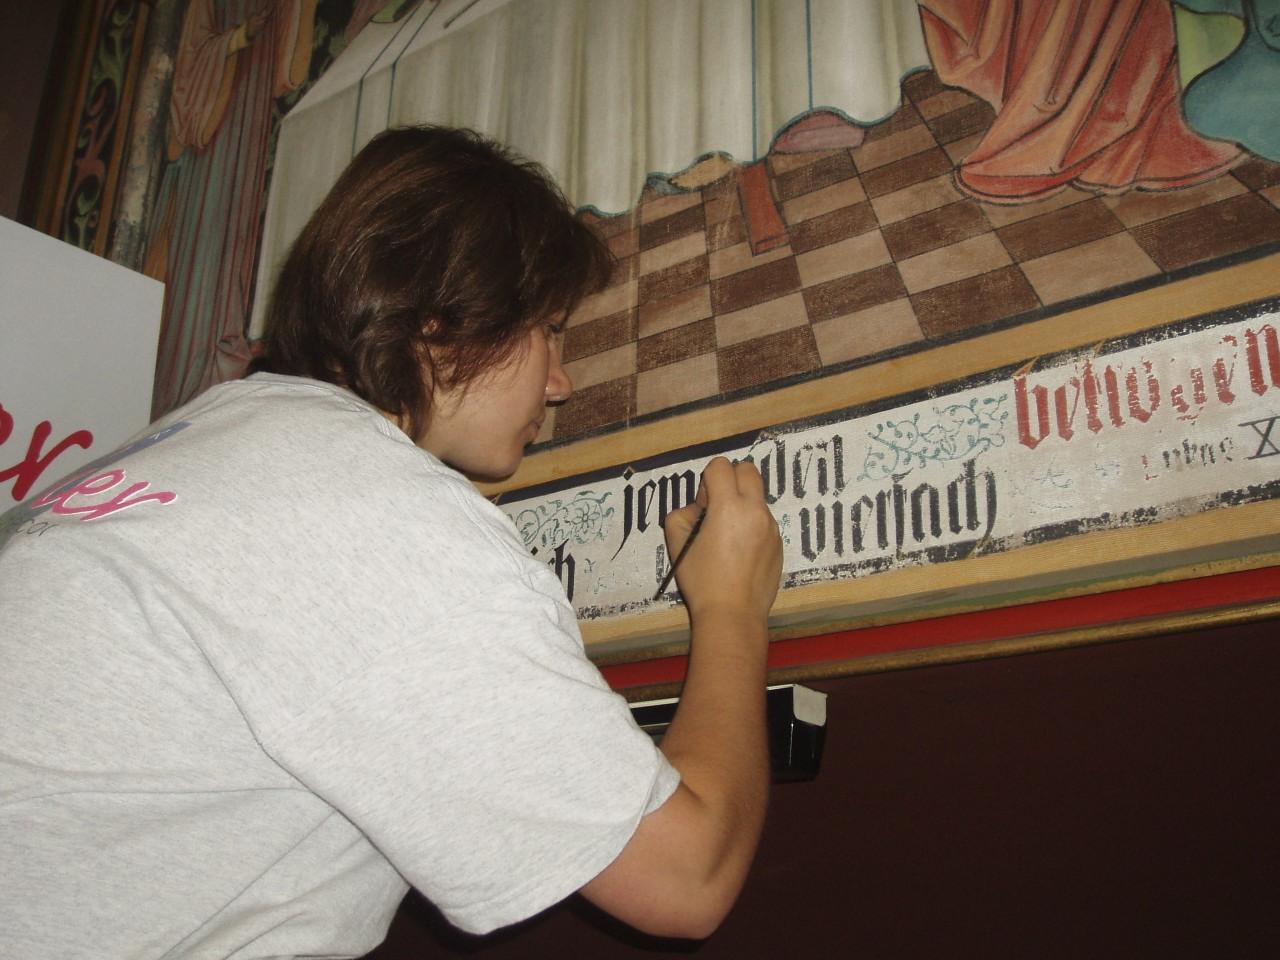 lettering in marienthal chapel